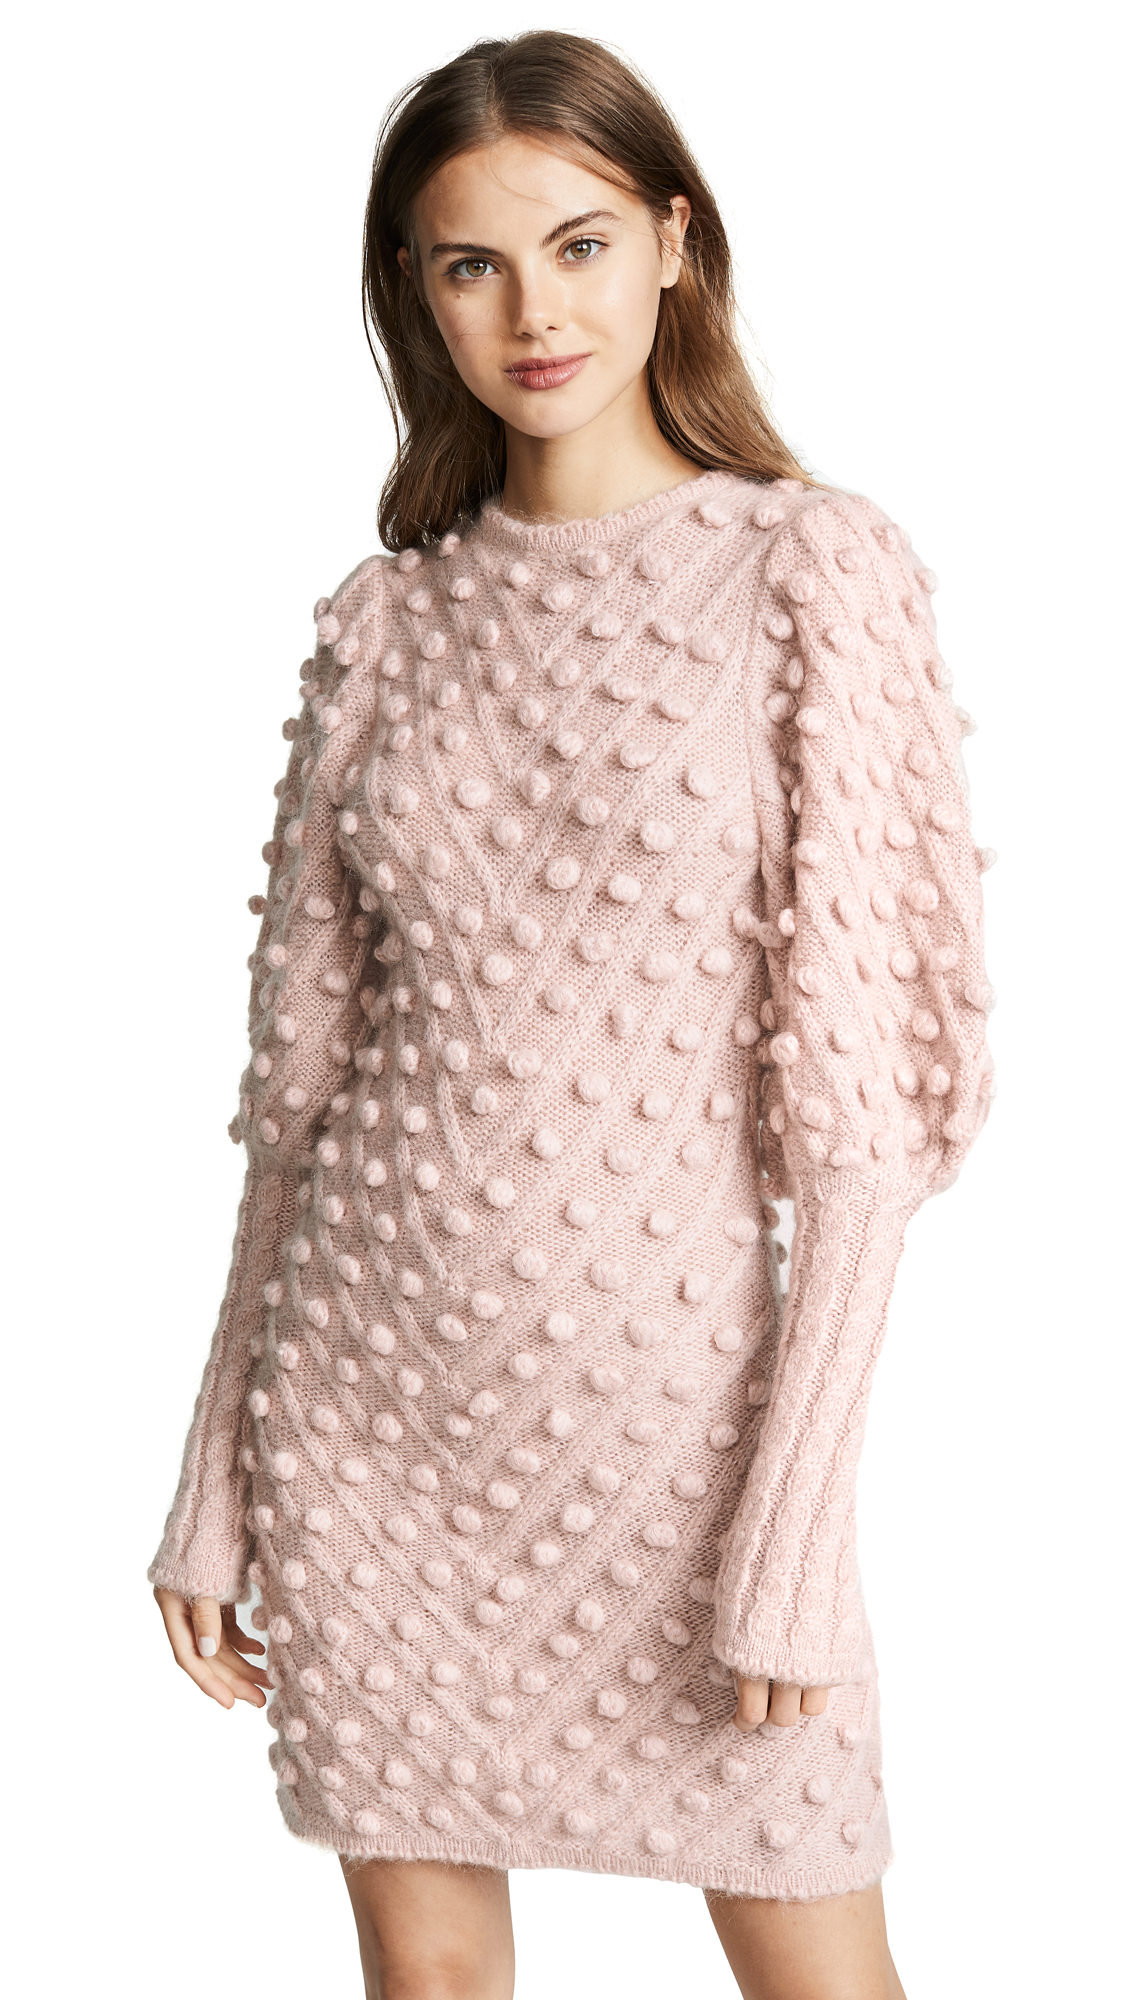 Fleeting Bauble Dress in Pink